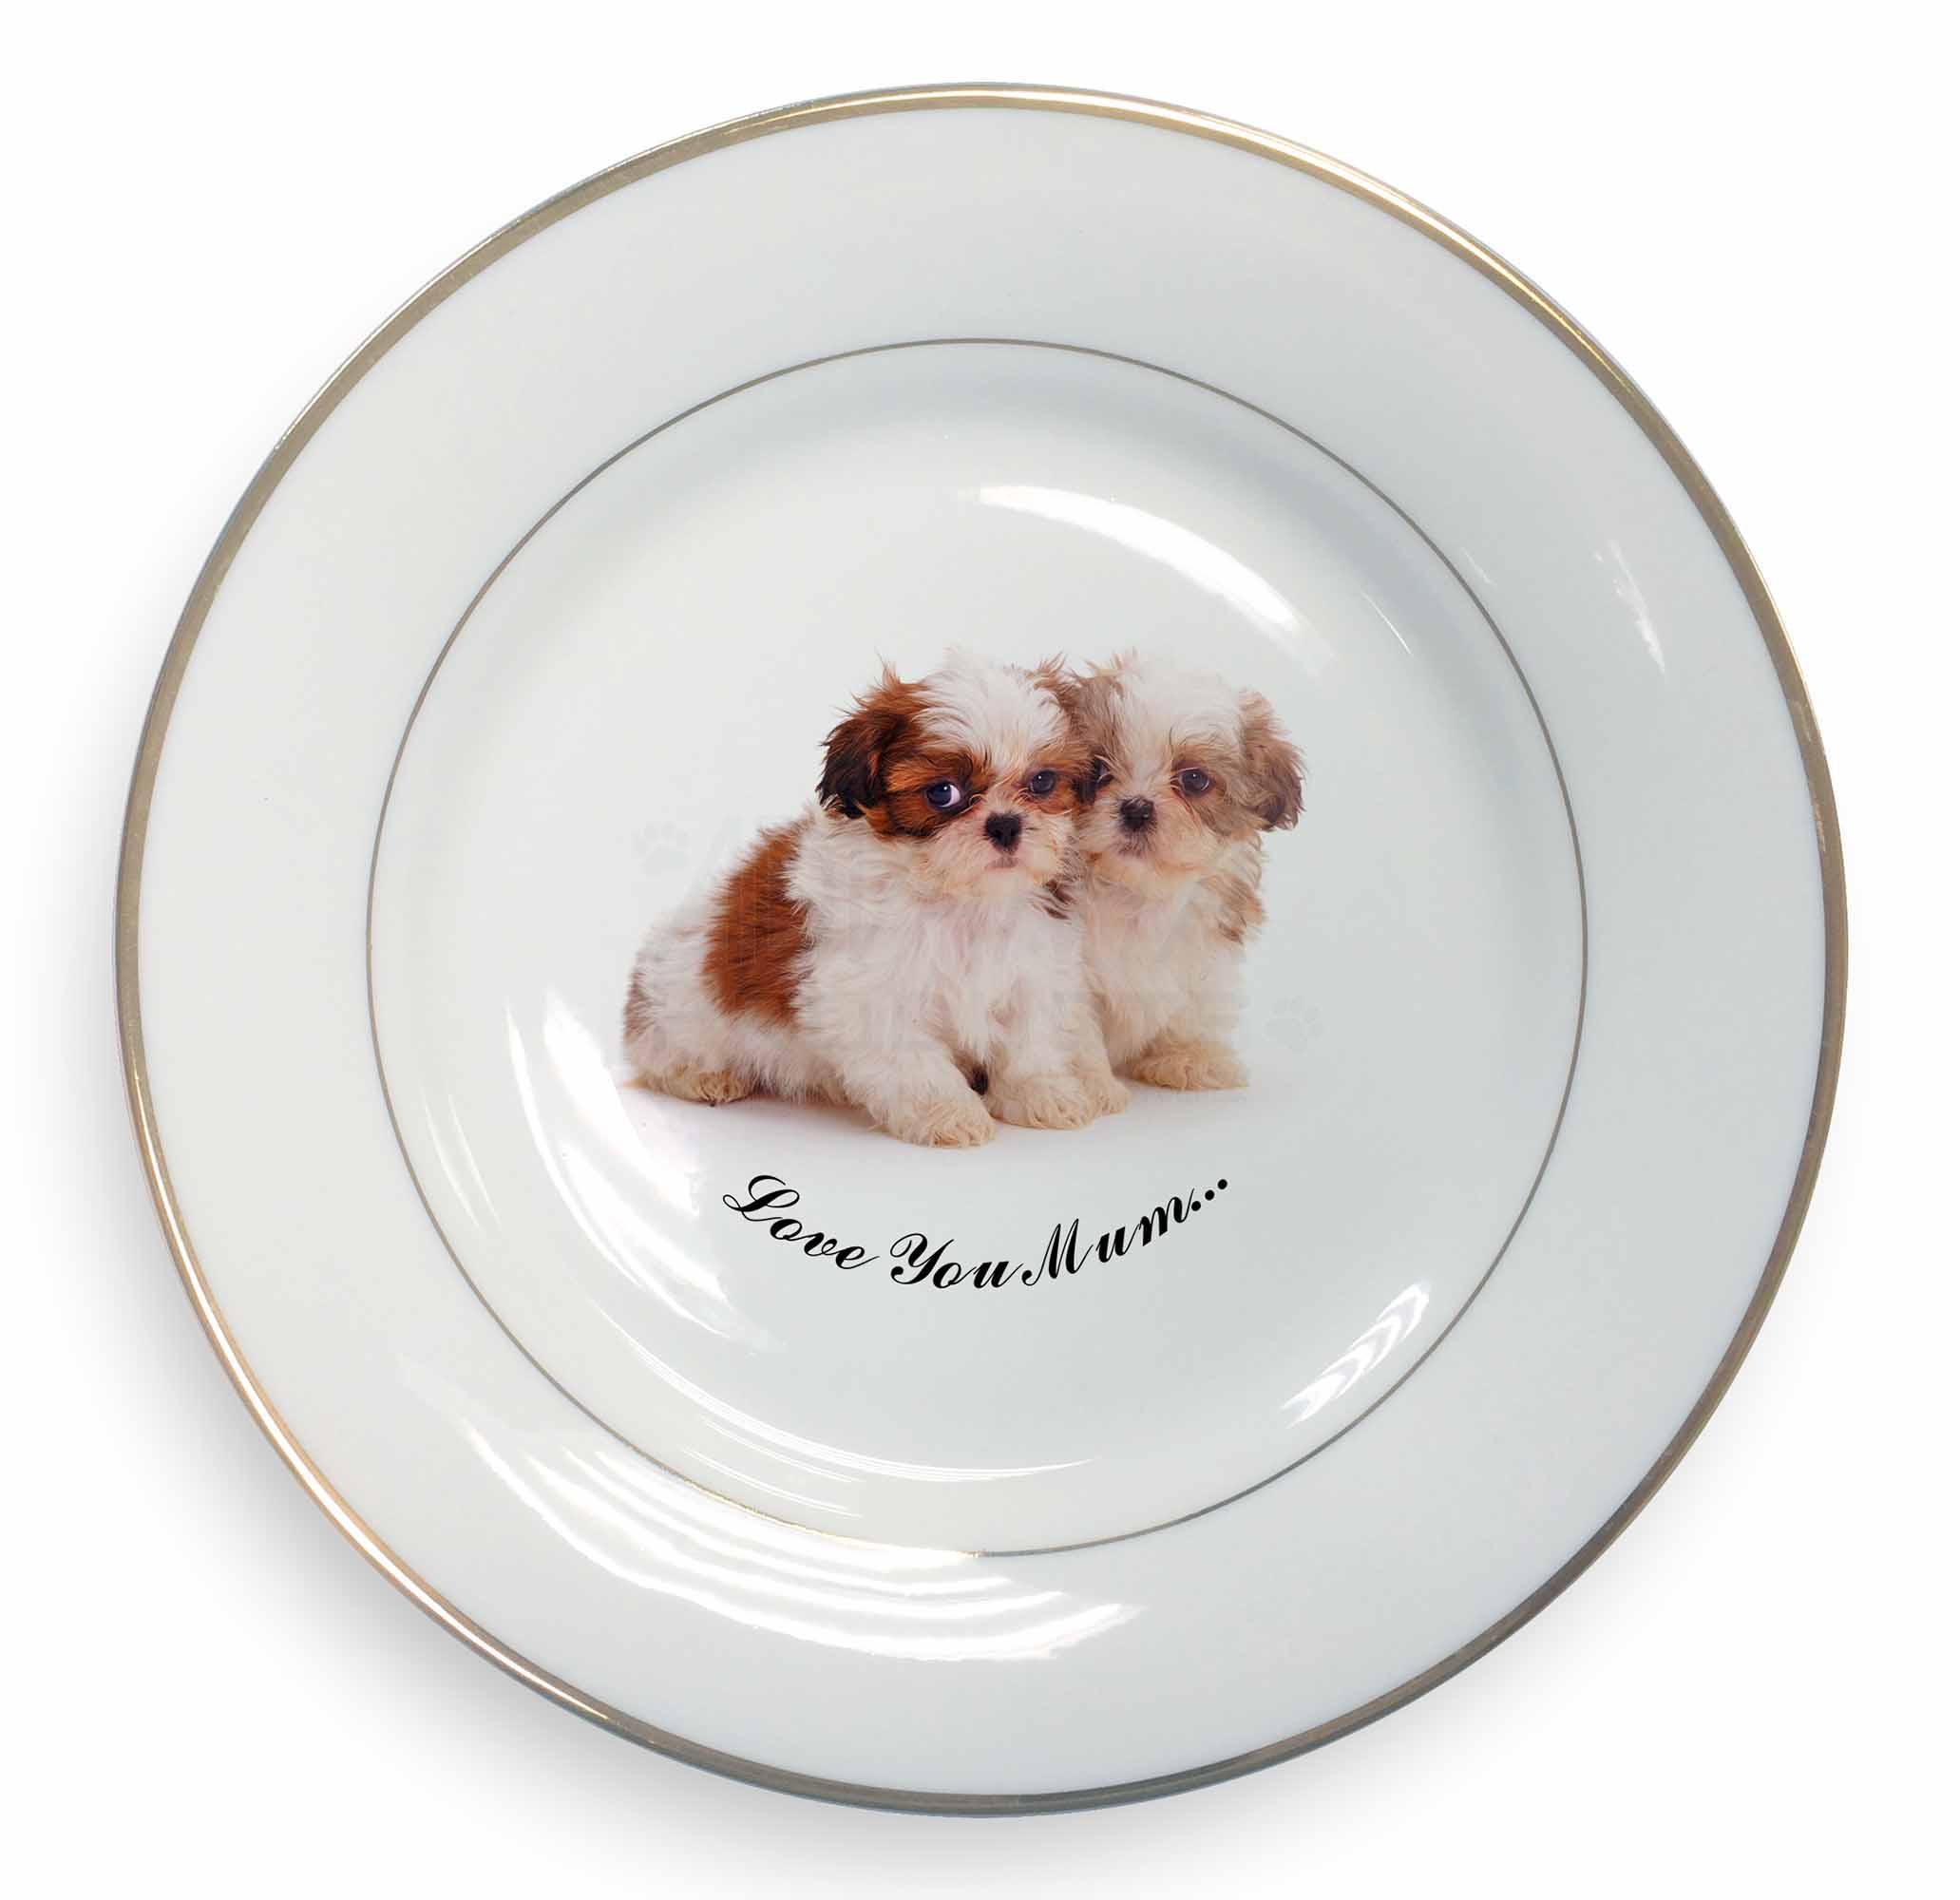 AD-SZ2lymPL Two Shih-Tzu /'Love You Mum/' Gold Rim Plate in Gift Box Christmas Pr